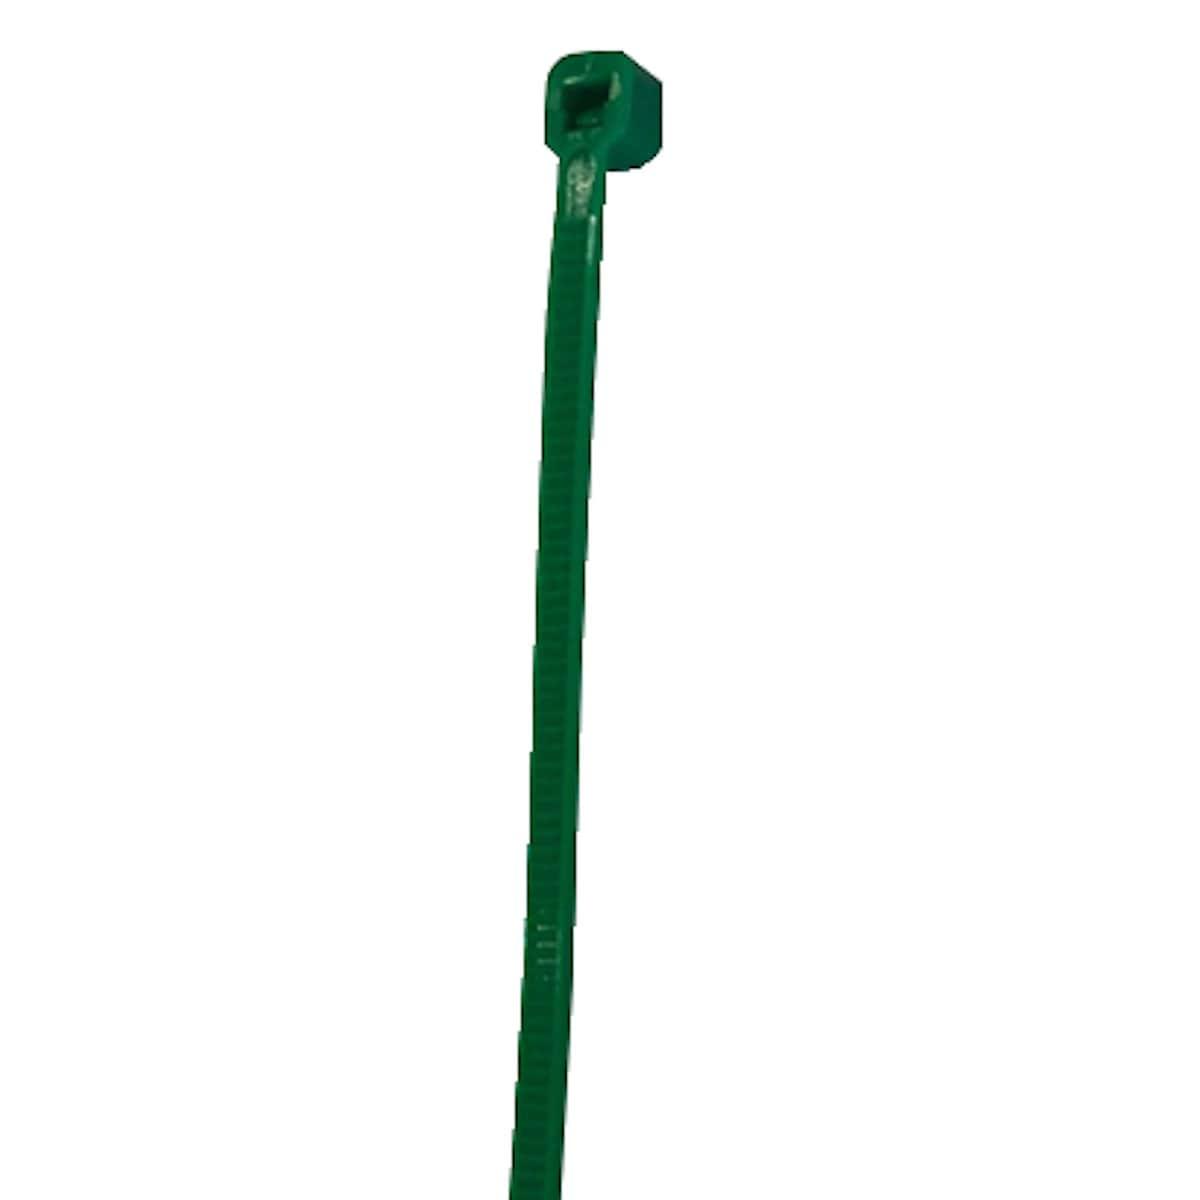 Buntband gröna 150×32 mm 100-pack